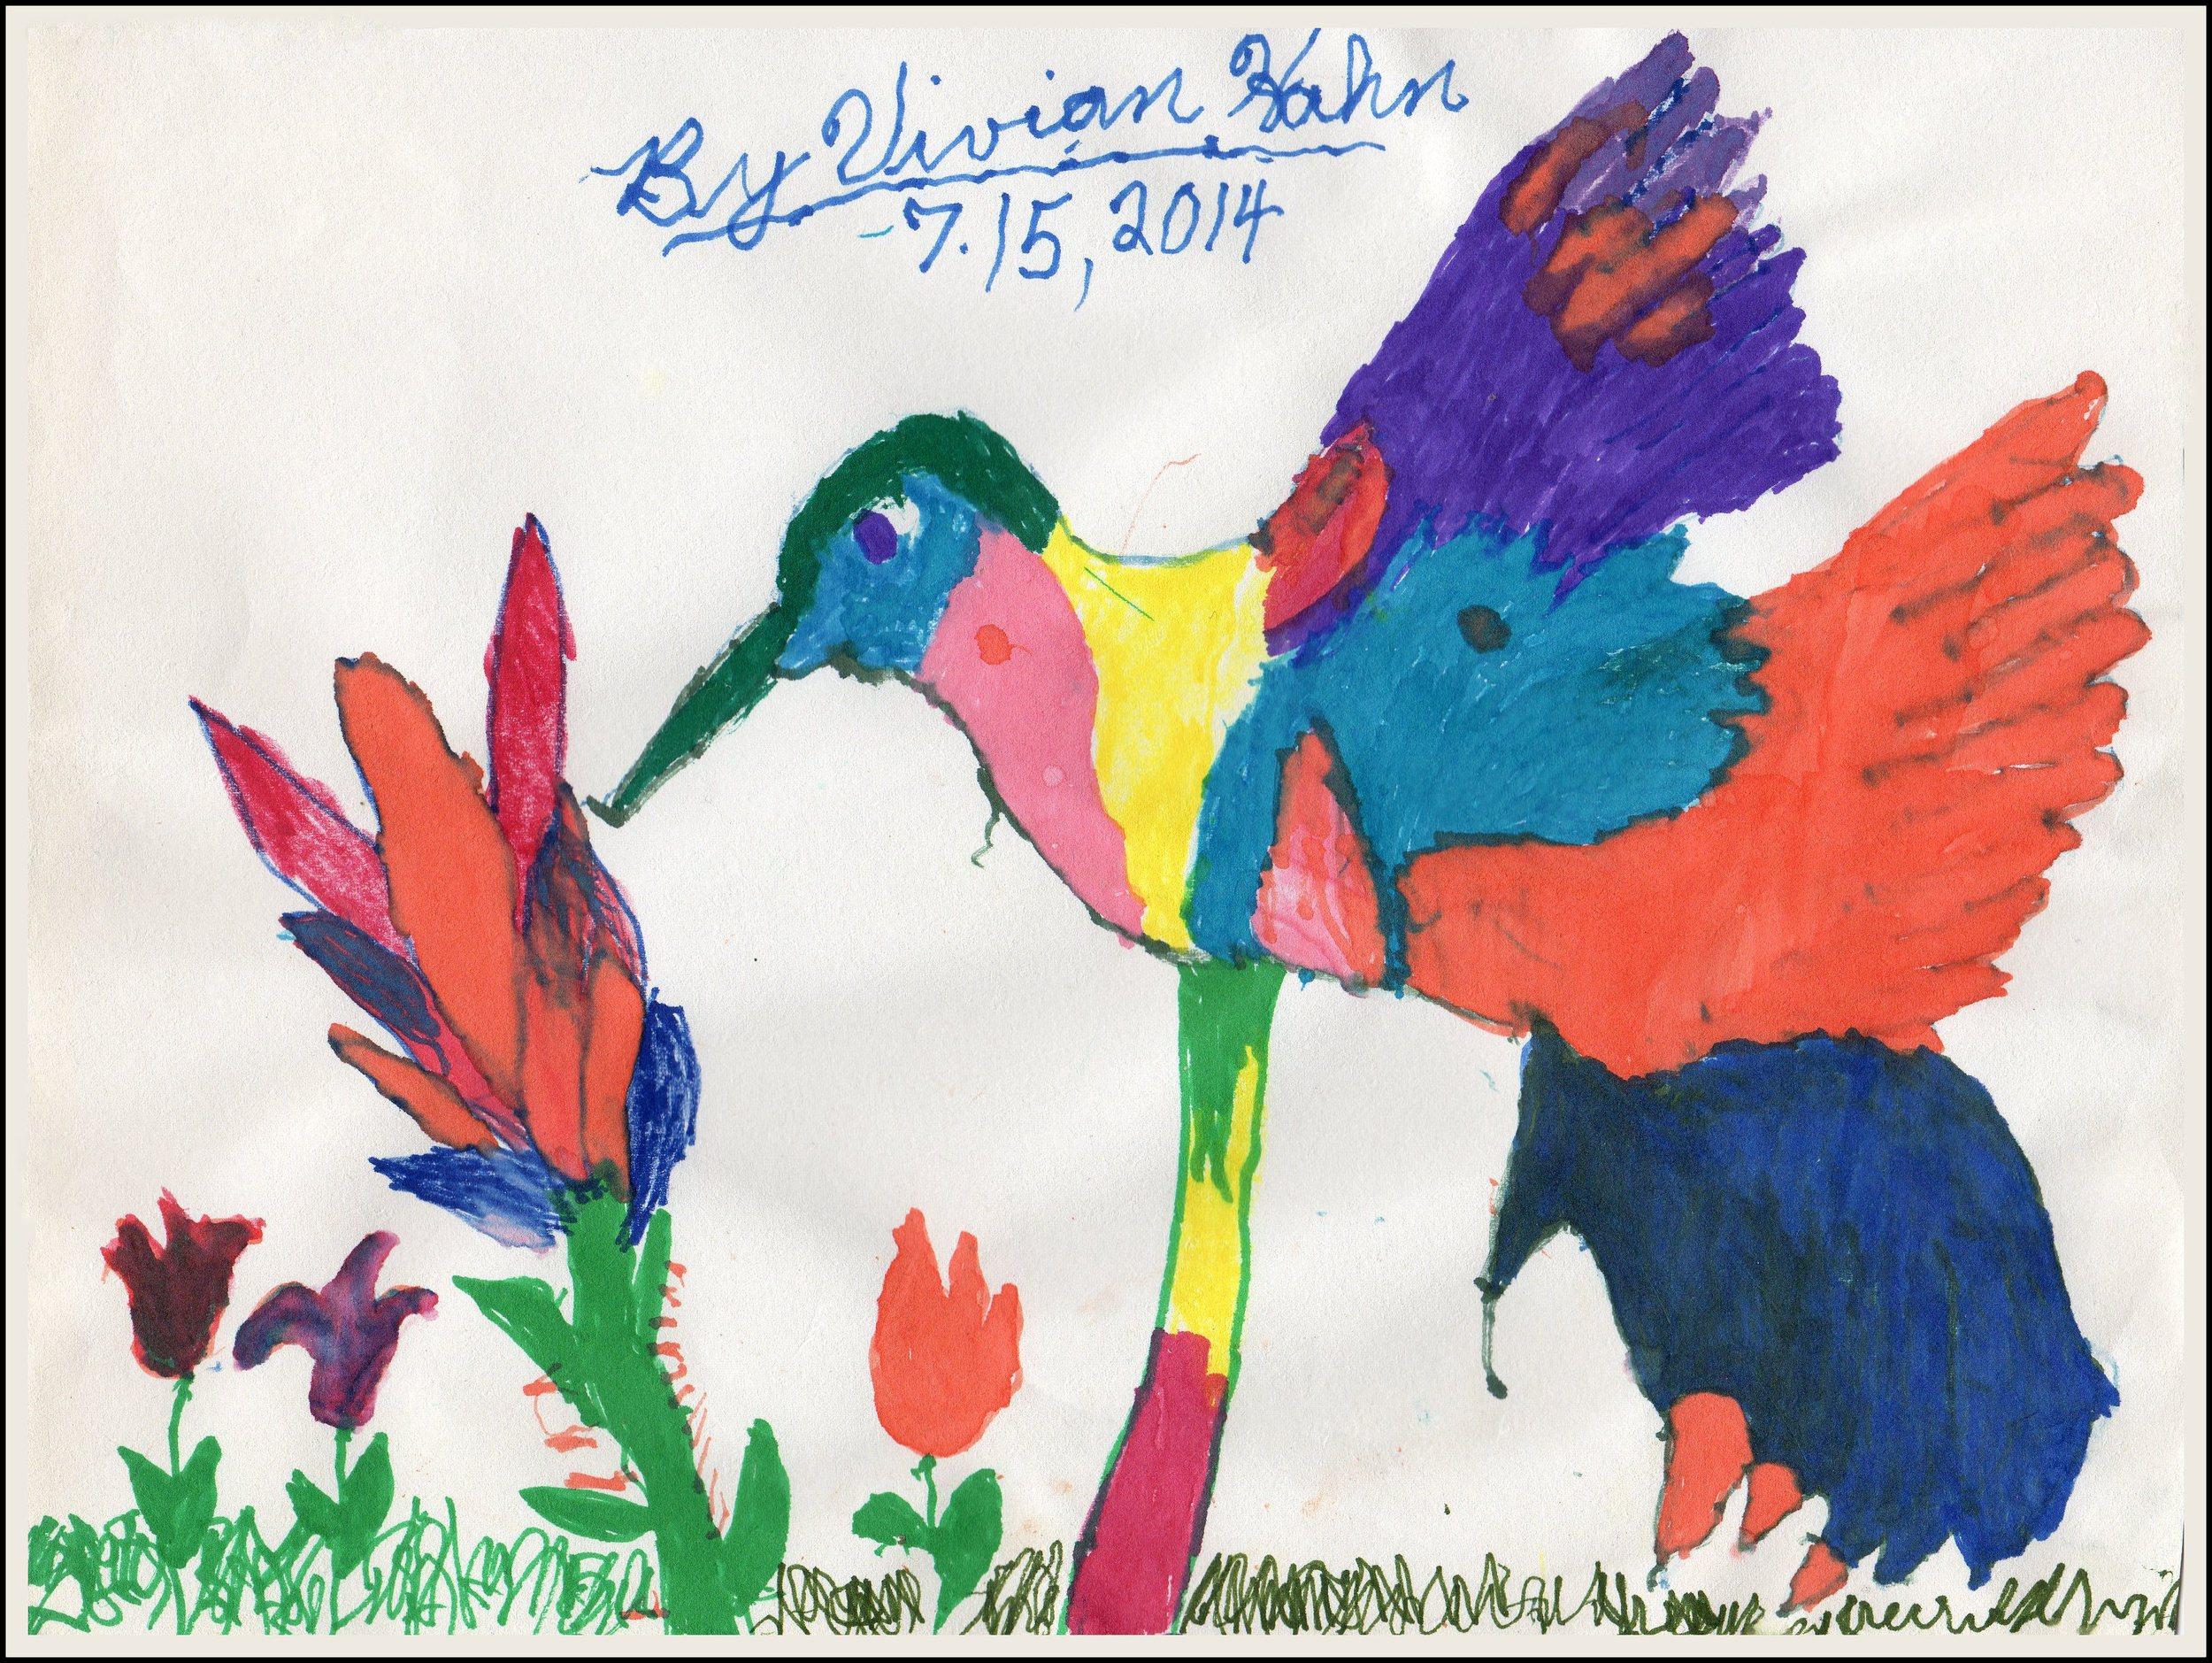 Hummingbird  Vivian Hahn 7/15/2014 Colored Markers on paper prints $20/originals $50